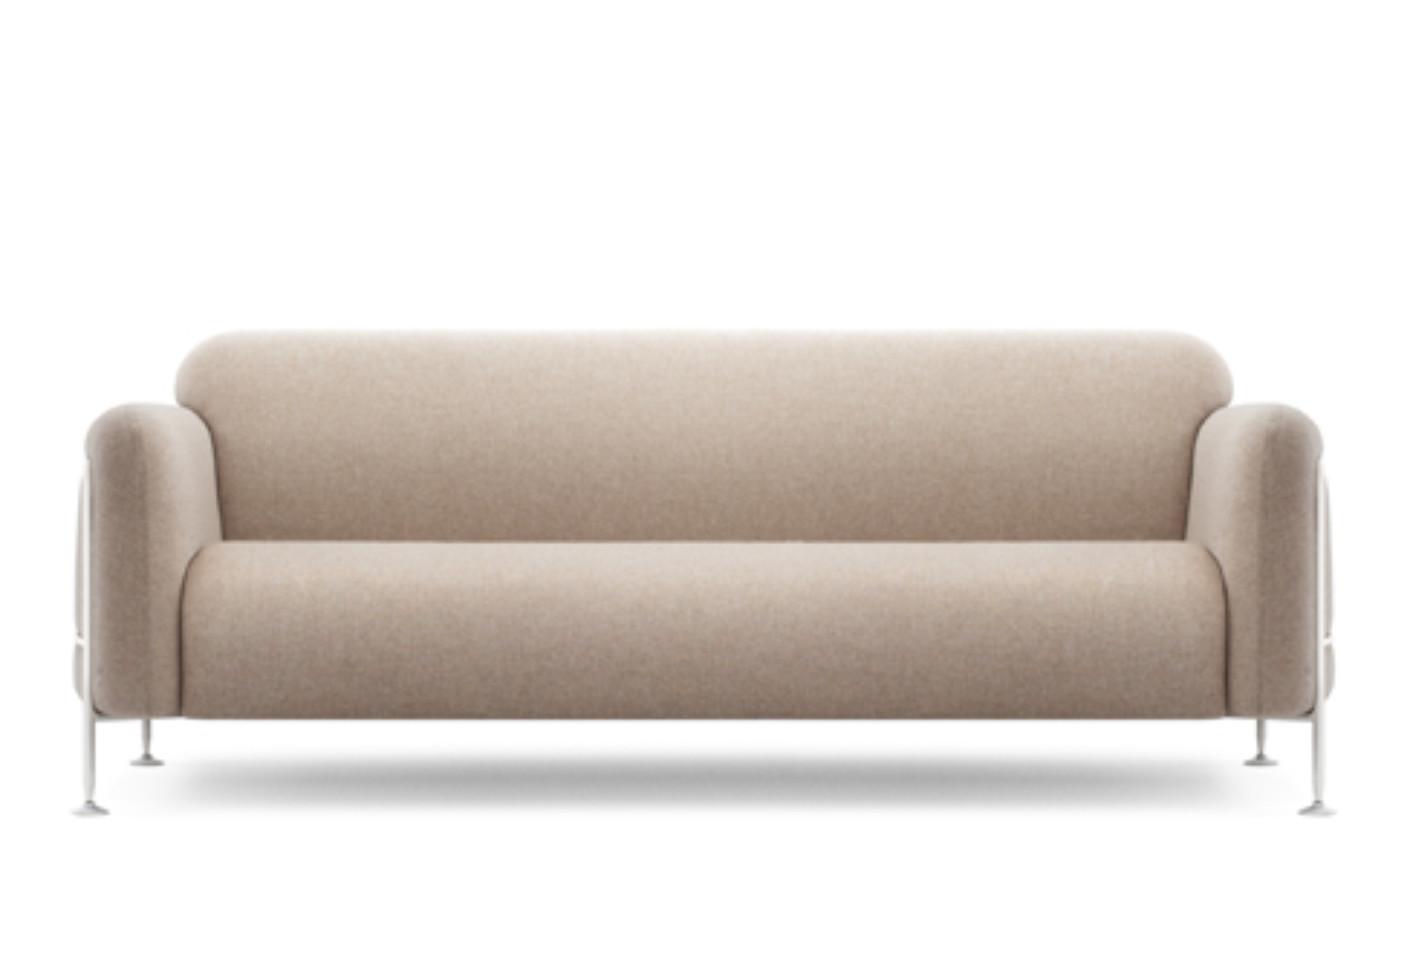 Full Size of Mega Sofa Furniture Trading Conforama 3 Osobowa Agata Meble Valladolid Big Braun Große Kissen Großes Ligne Roset Türkis Beziehen Sofort Lieferbar Cassina Sofa Mega Sofa